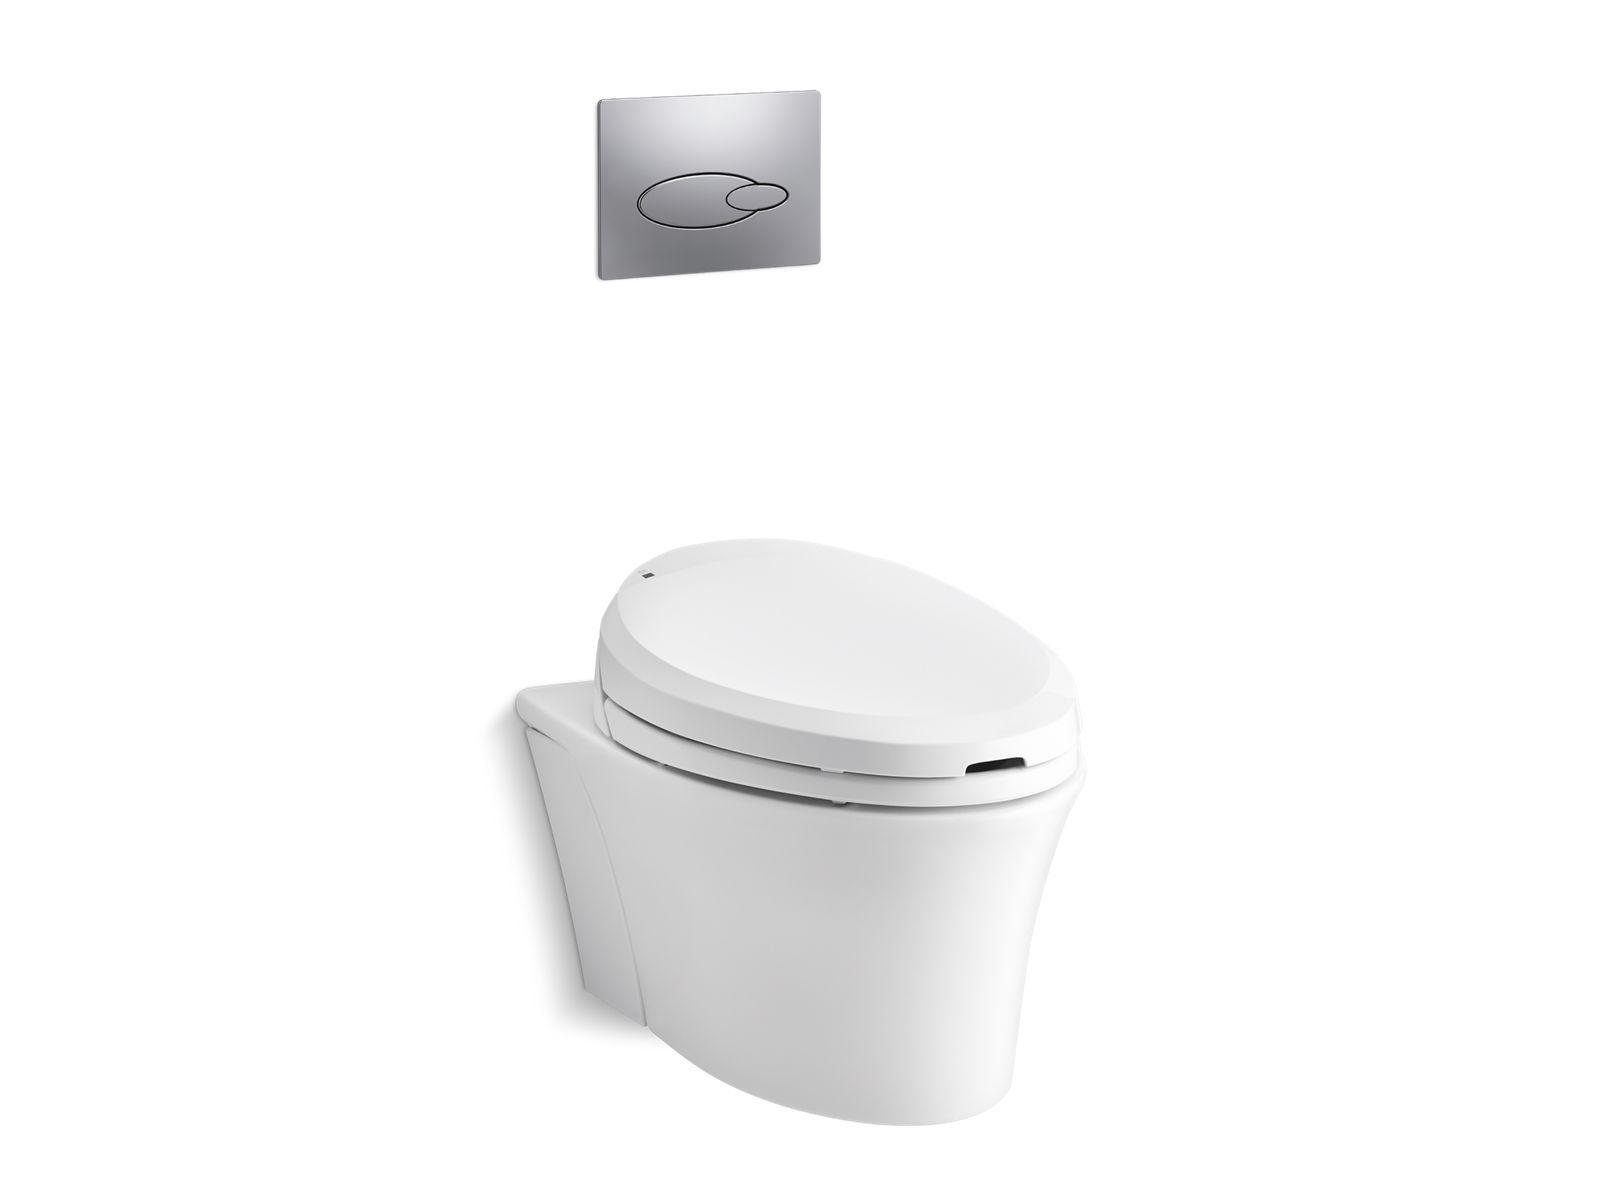 Excellent K 6300 Veil Wall Hung Toilet Bowl With C3 201 Bidet Seat Inzonedesignstudio Interior Chair Design Inzonedesignstudiocom